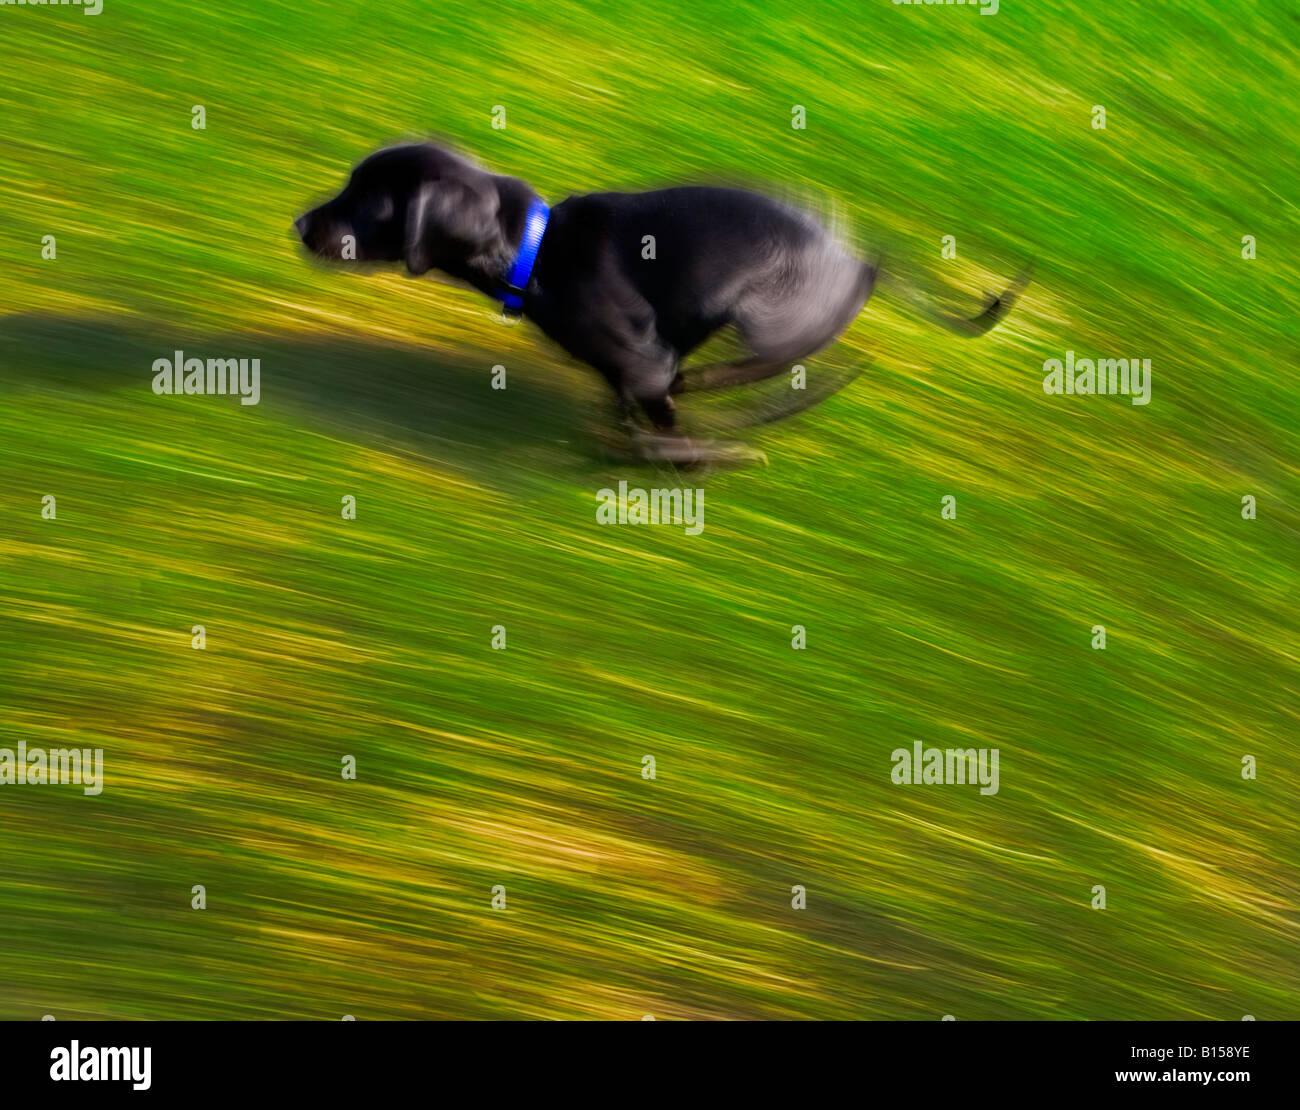 A black dog running - Stock Image